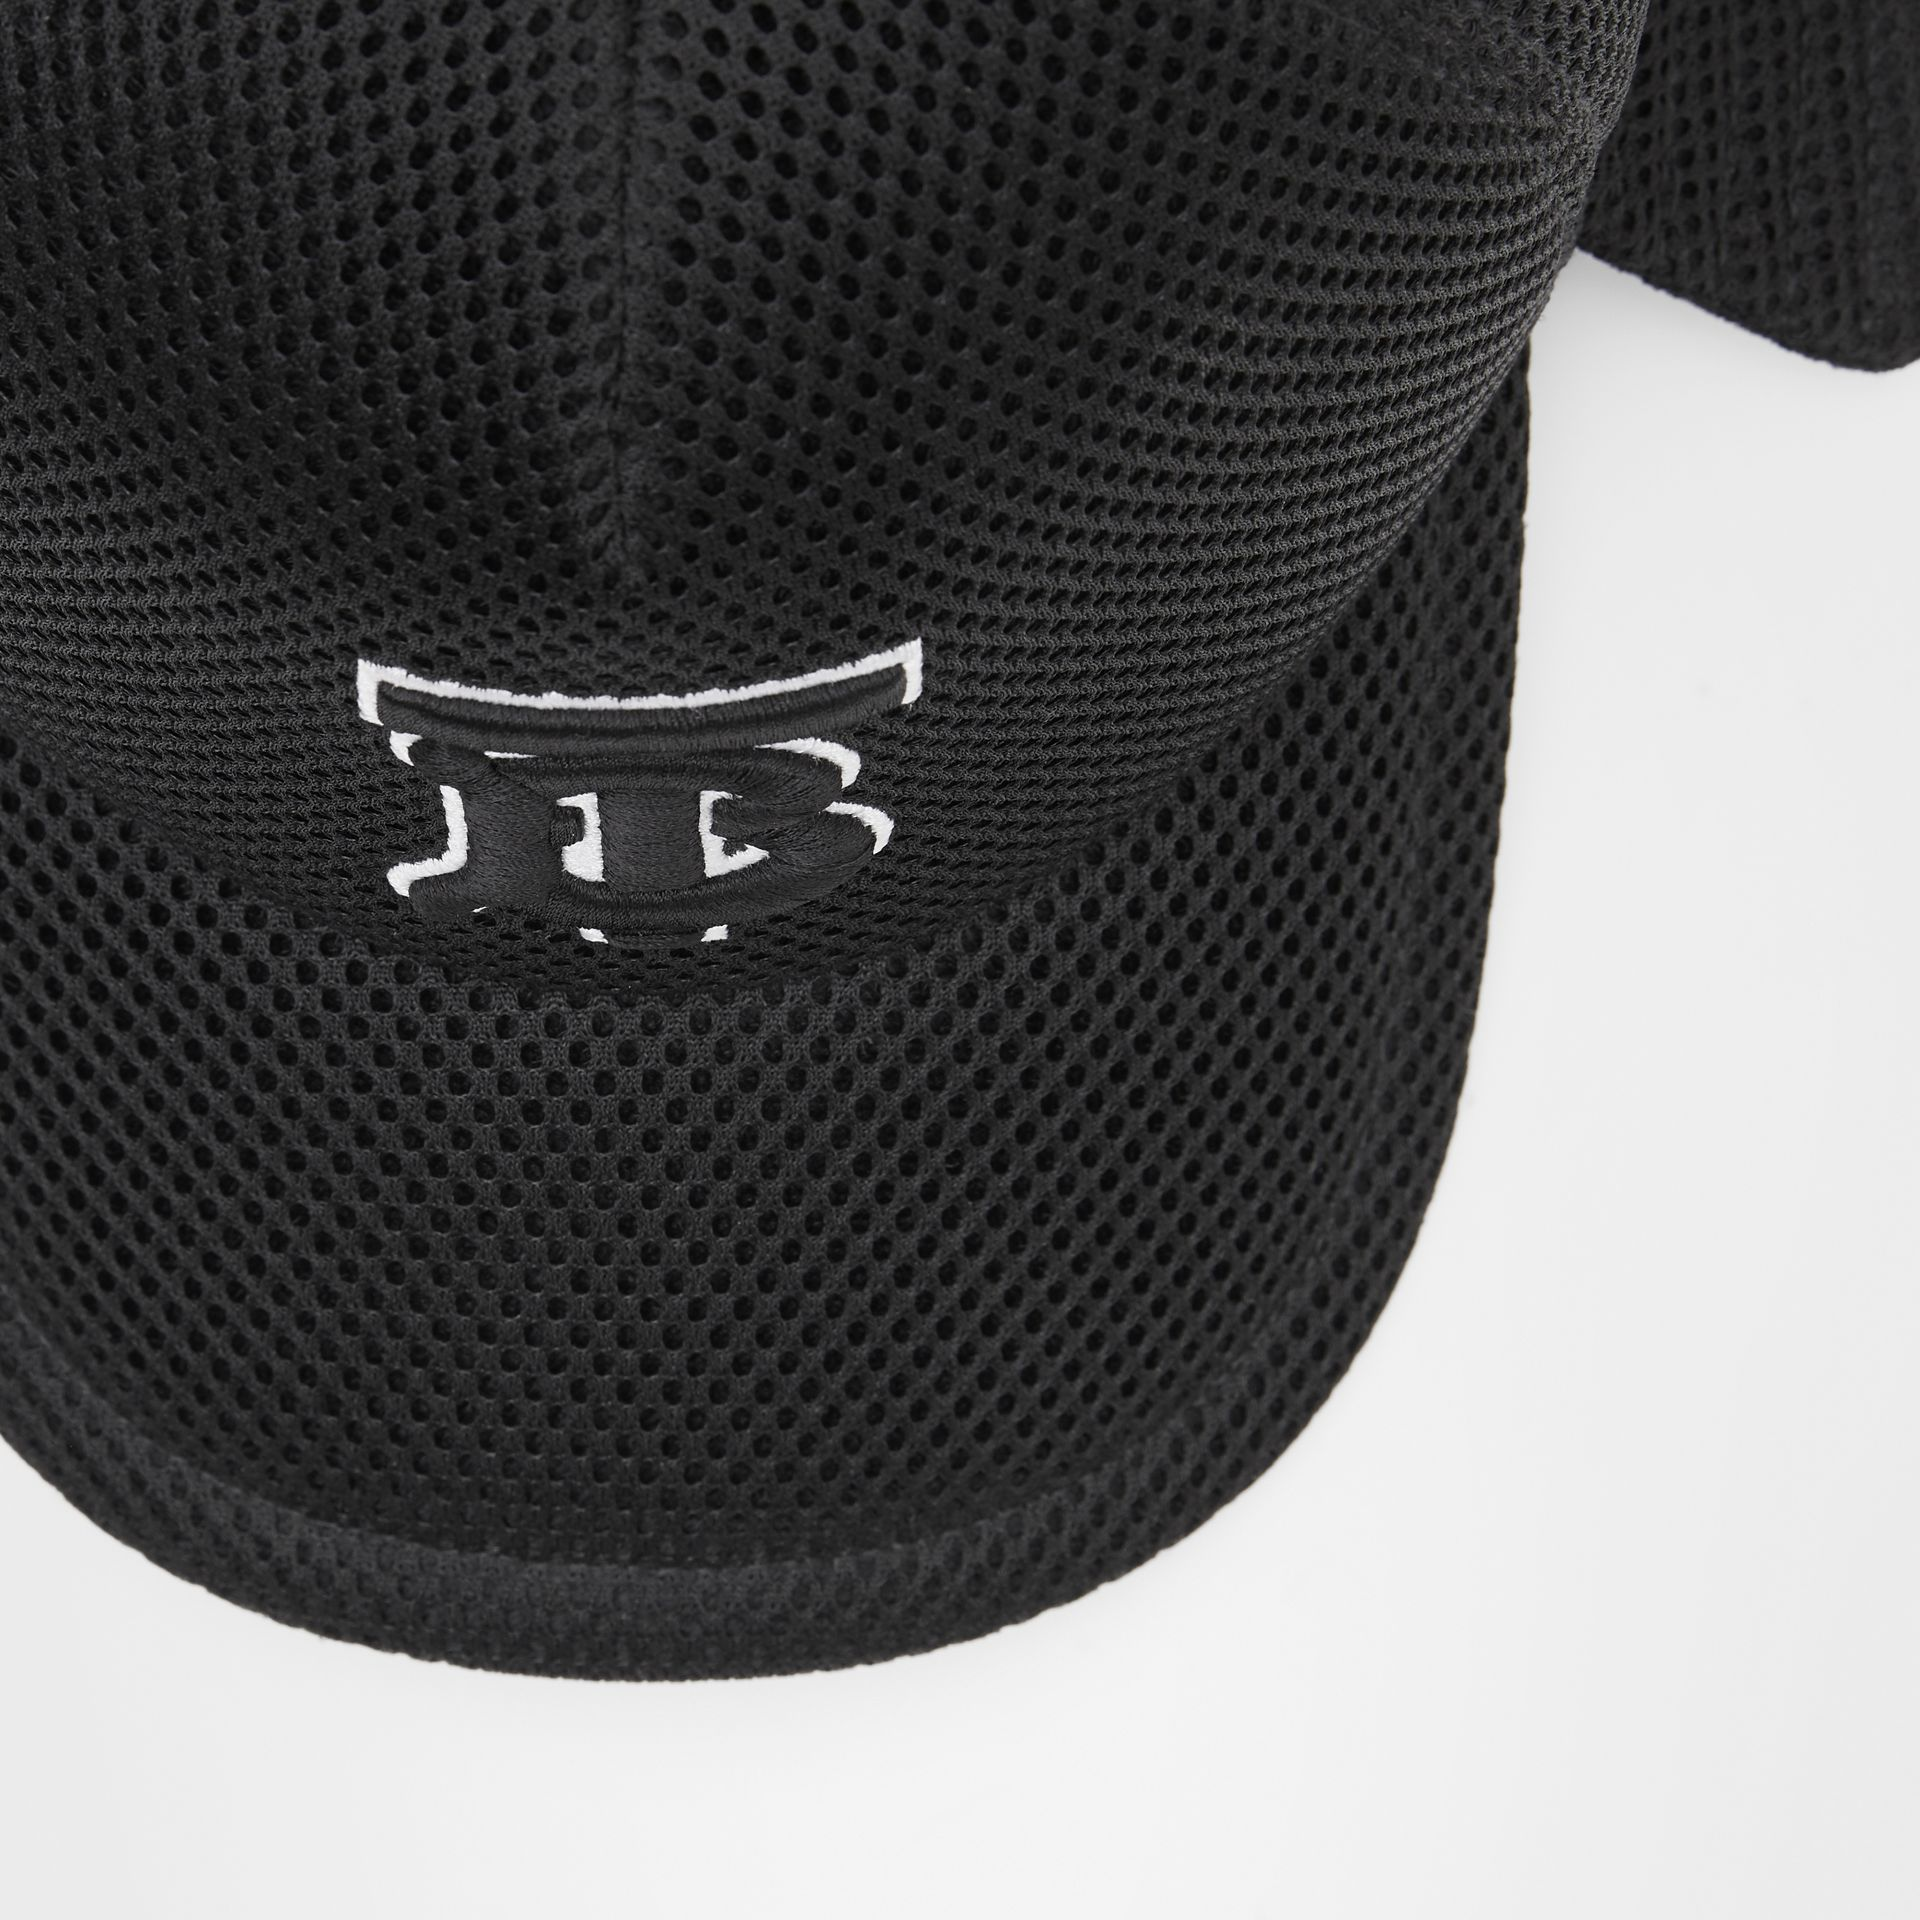 Monogram Motif Reconstructed Baseball Cap in Black   Burberry - gallery image 1